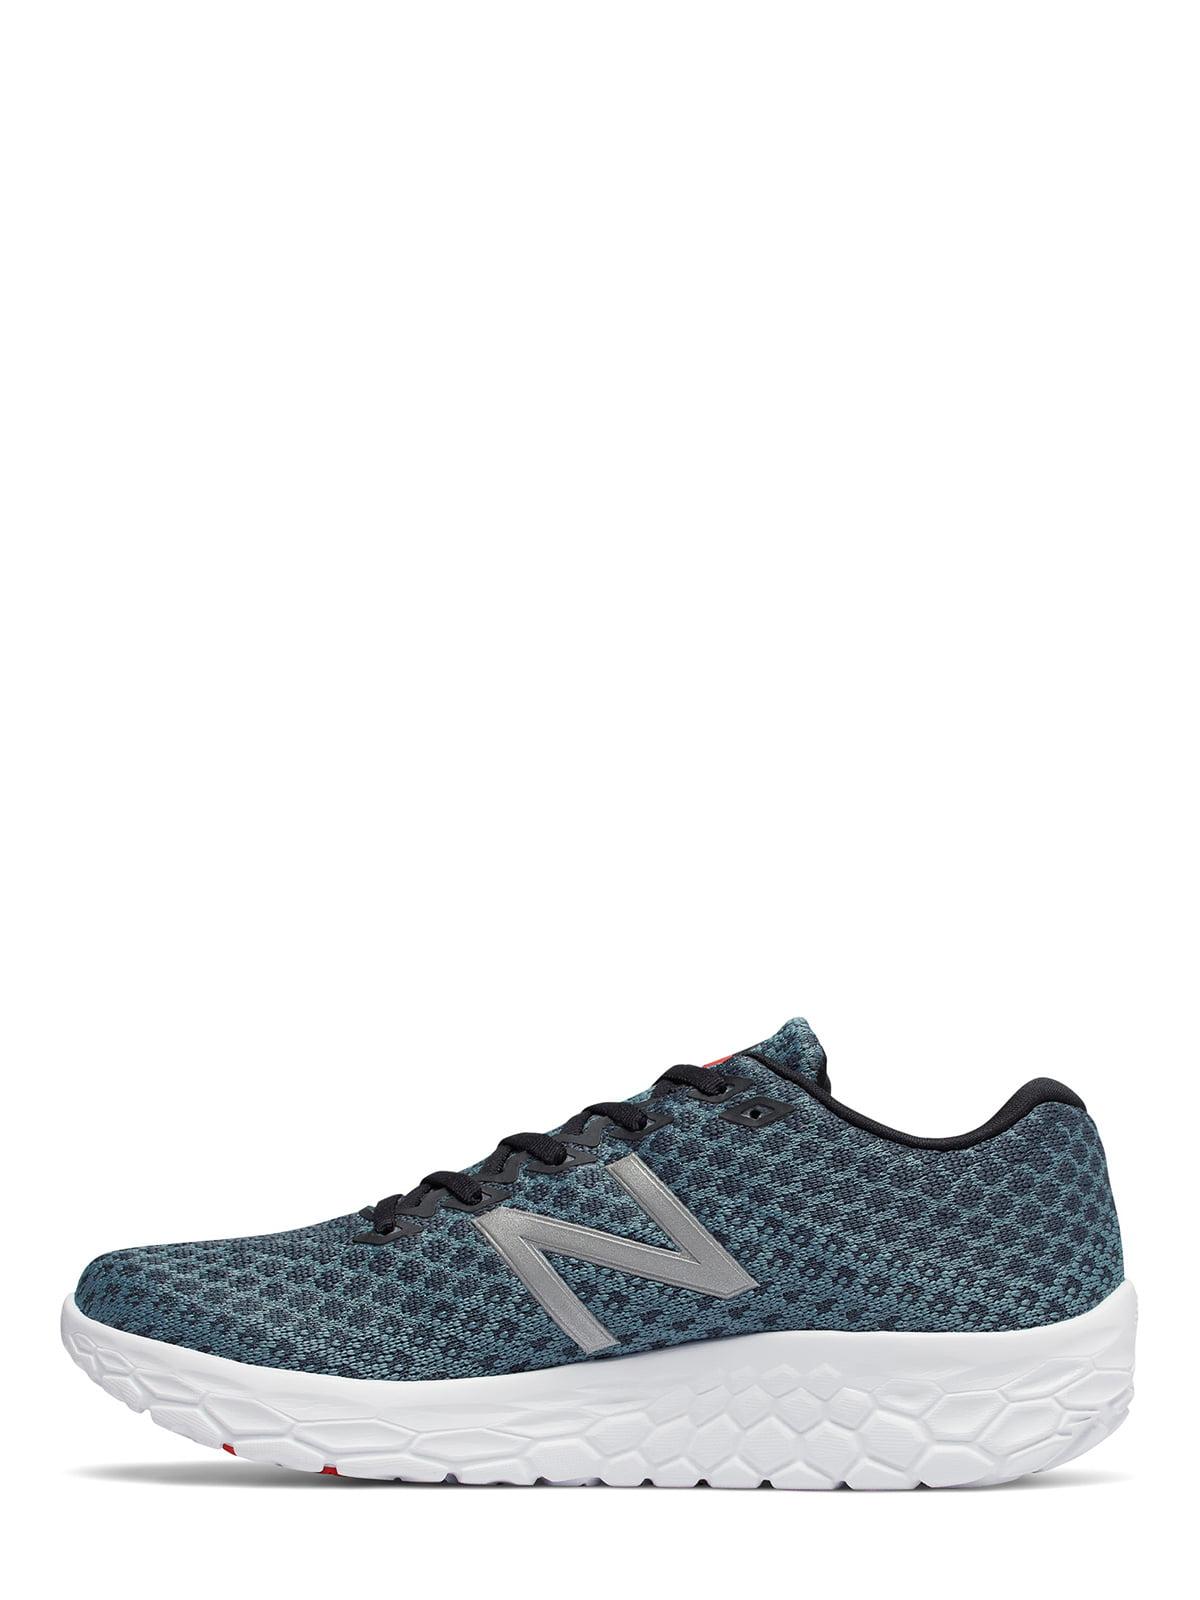 Кросівки сіро-сині Fresh Foam Beacon | 4579051 | фото 2